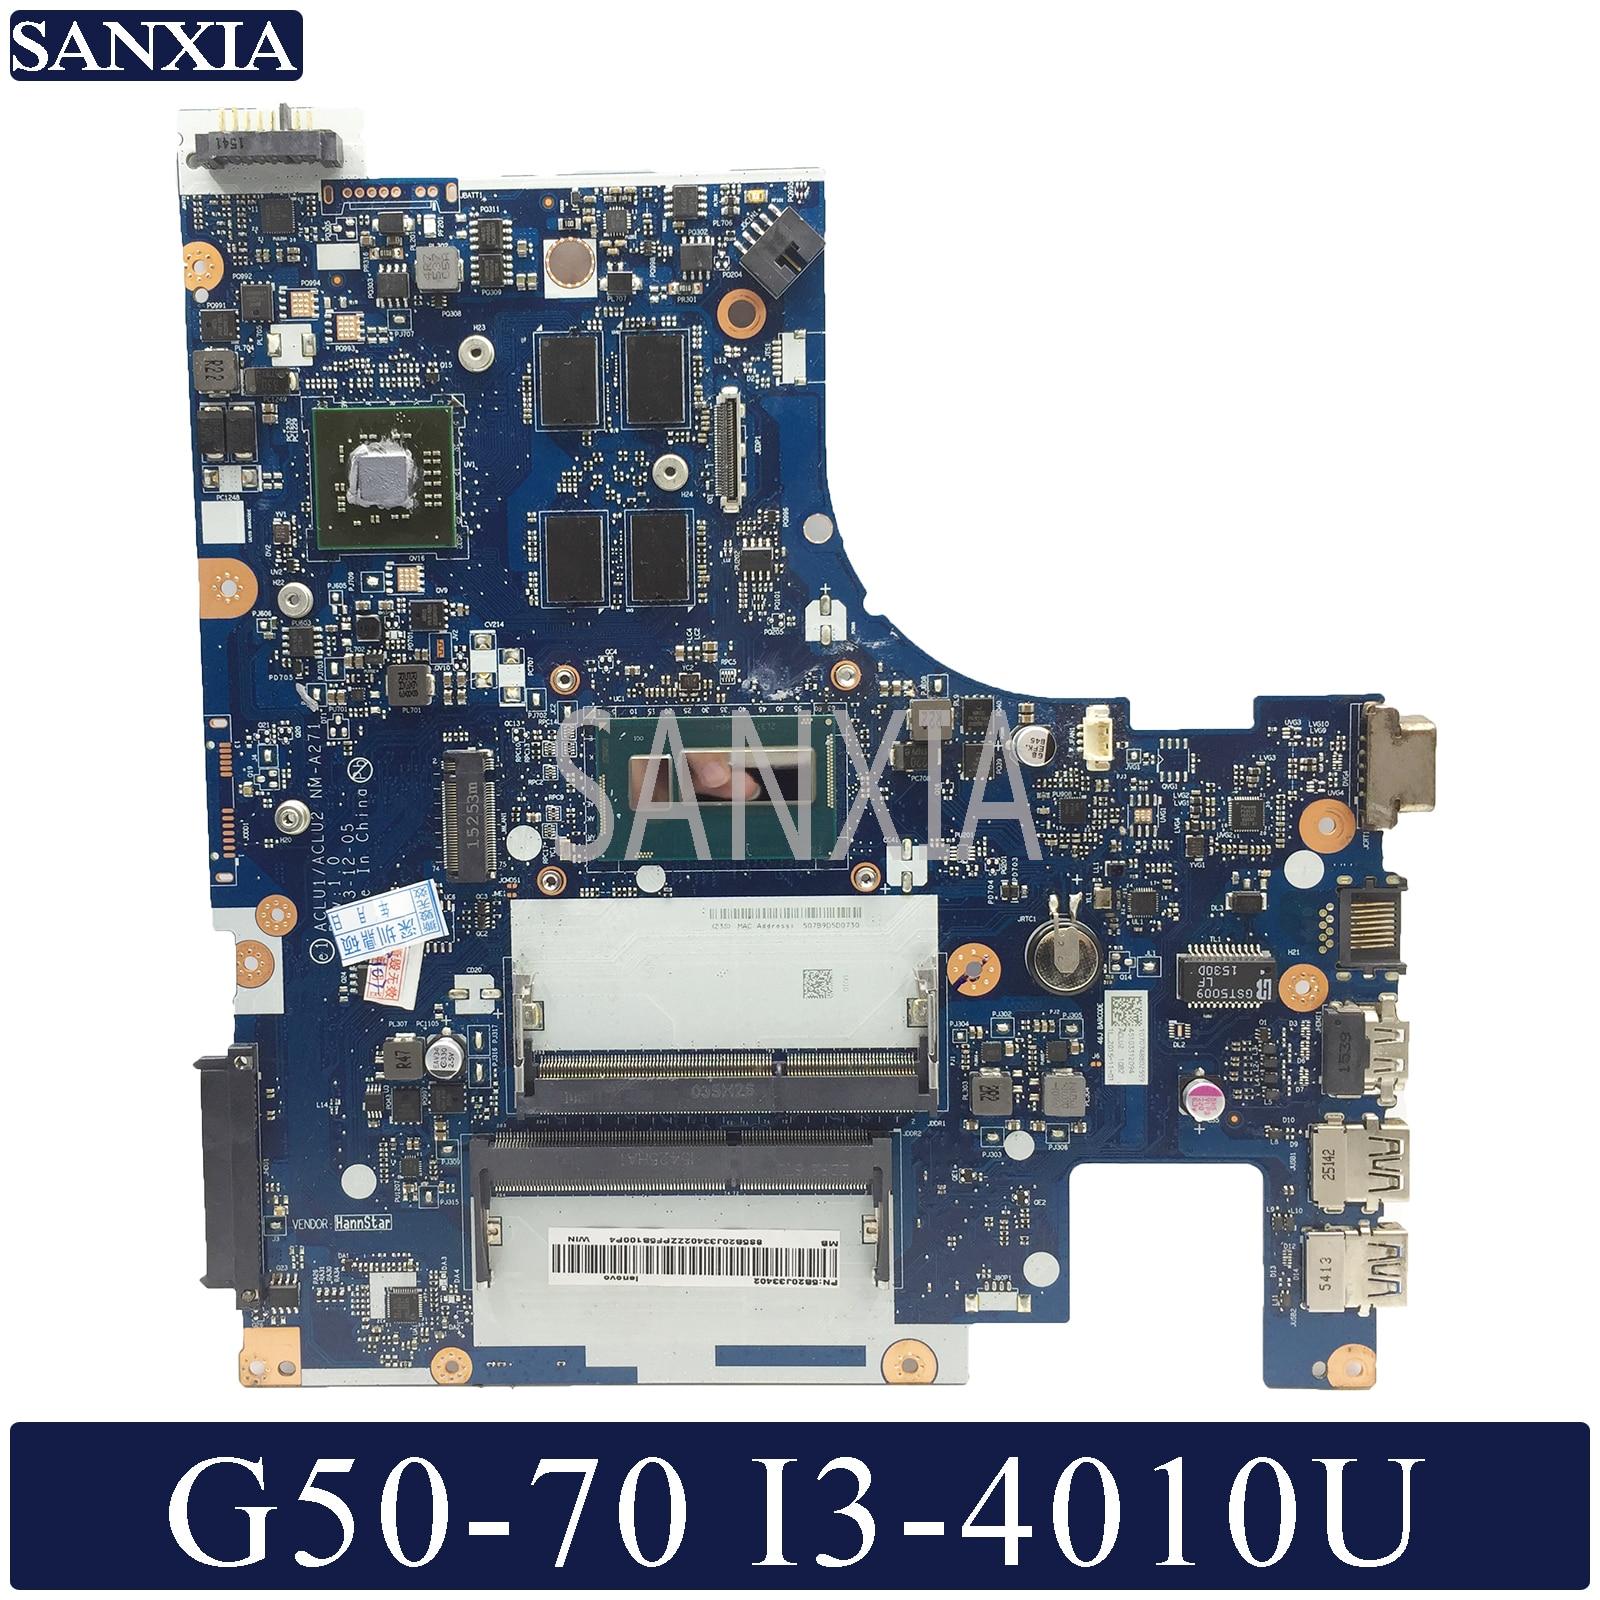 KEFU NM-A271 Laptop motherboard für Lenovo G50-70 original mainboard I3-4010U